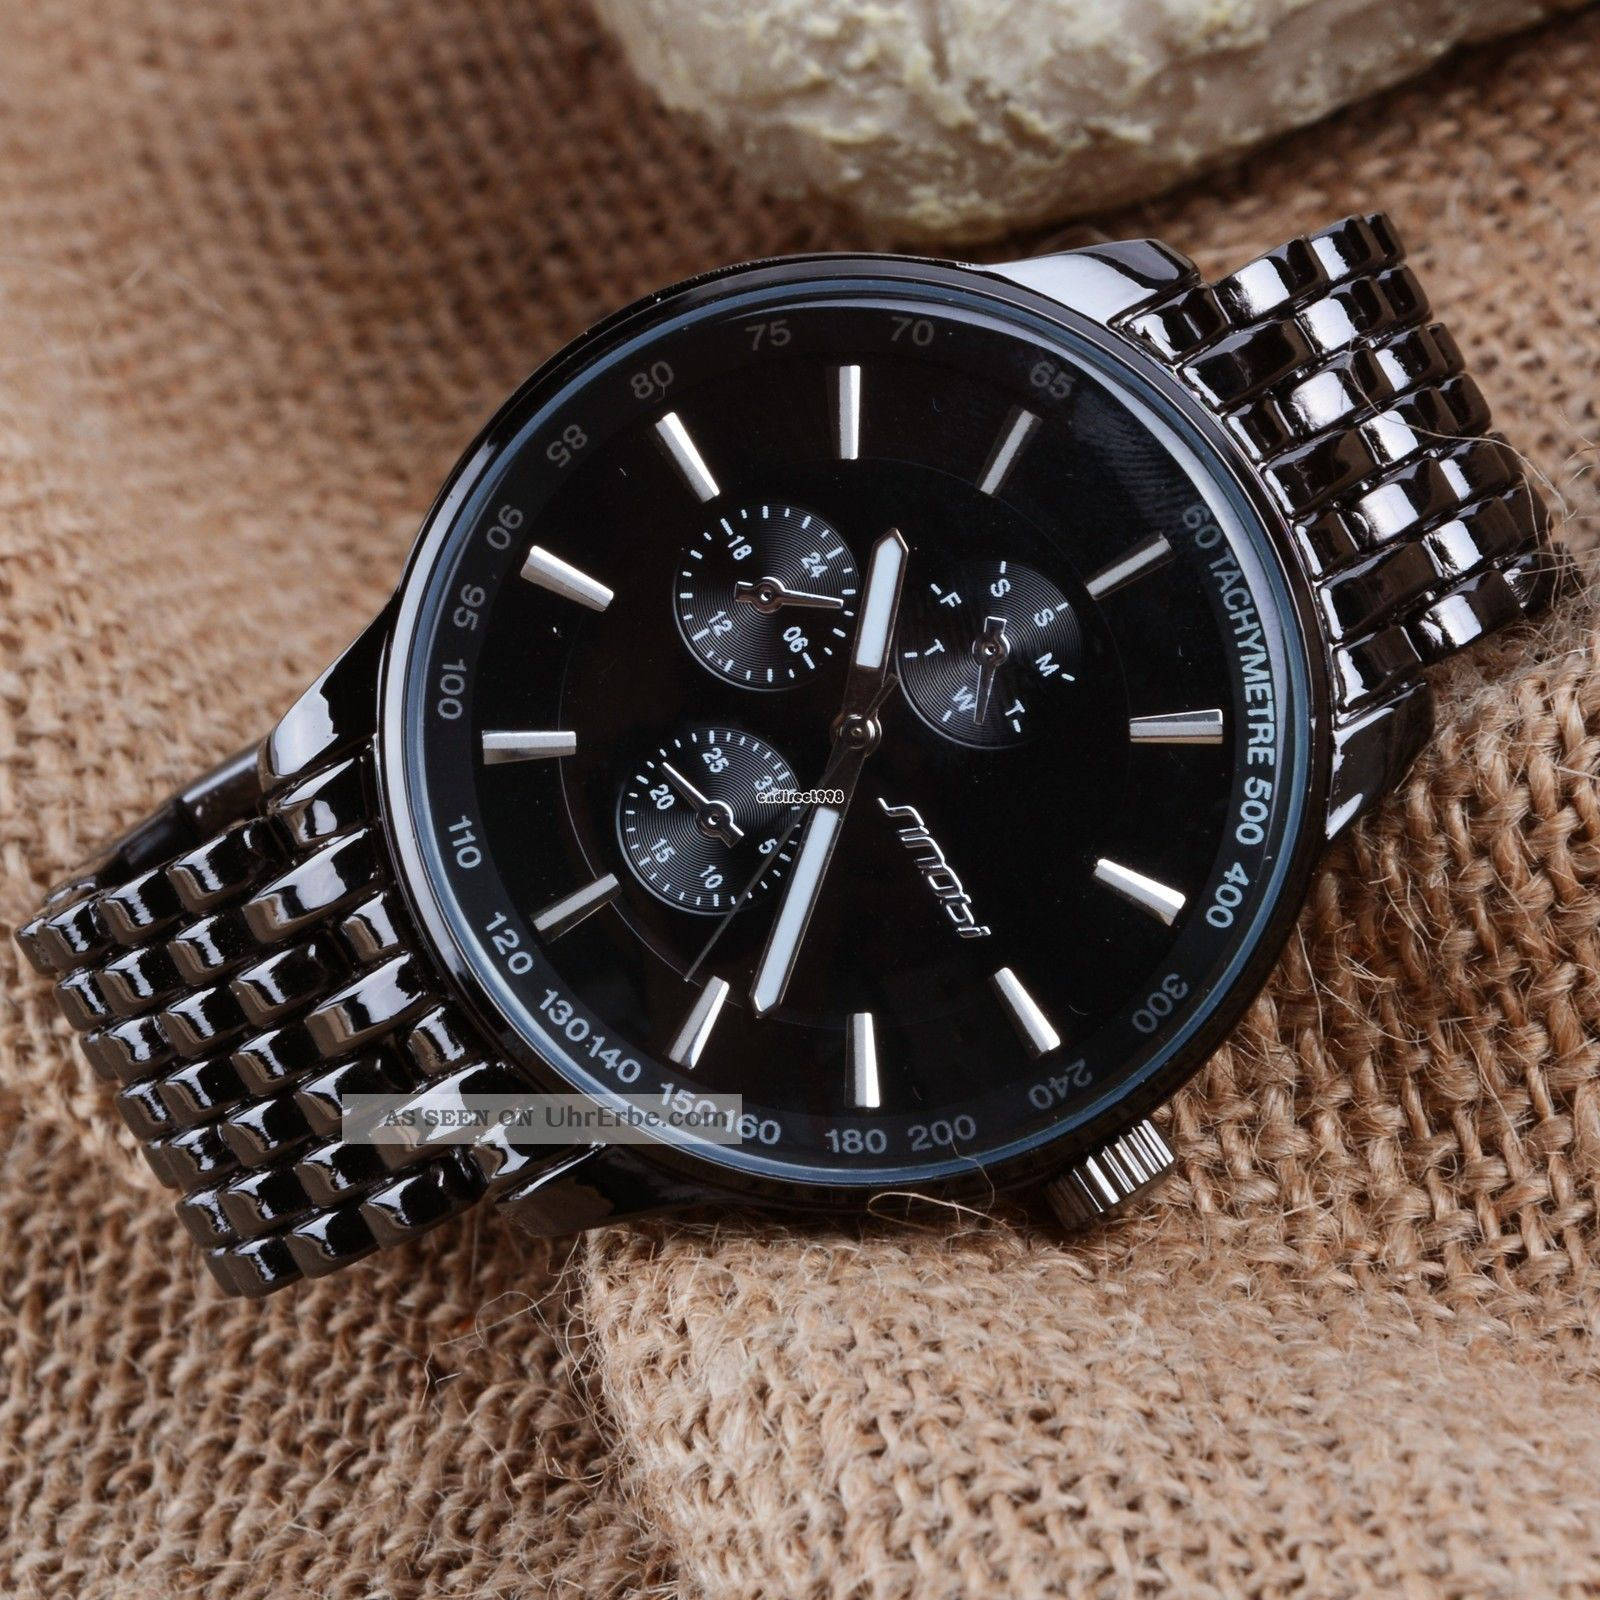 elegante herrenuhr automatik mechanische herren uhr armbanduhr damen herren. Black Bedroom Furniture Sets. Home Design Ideas